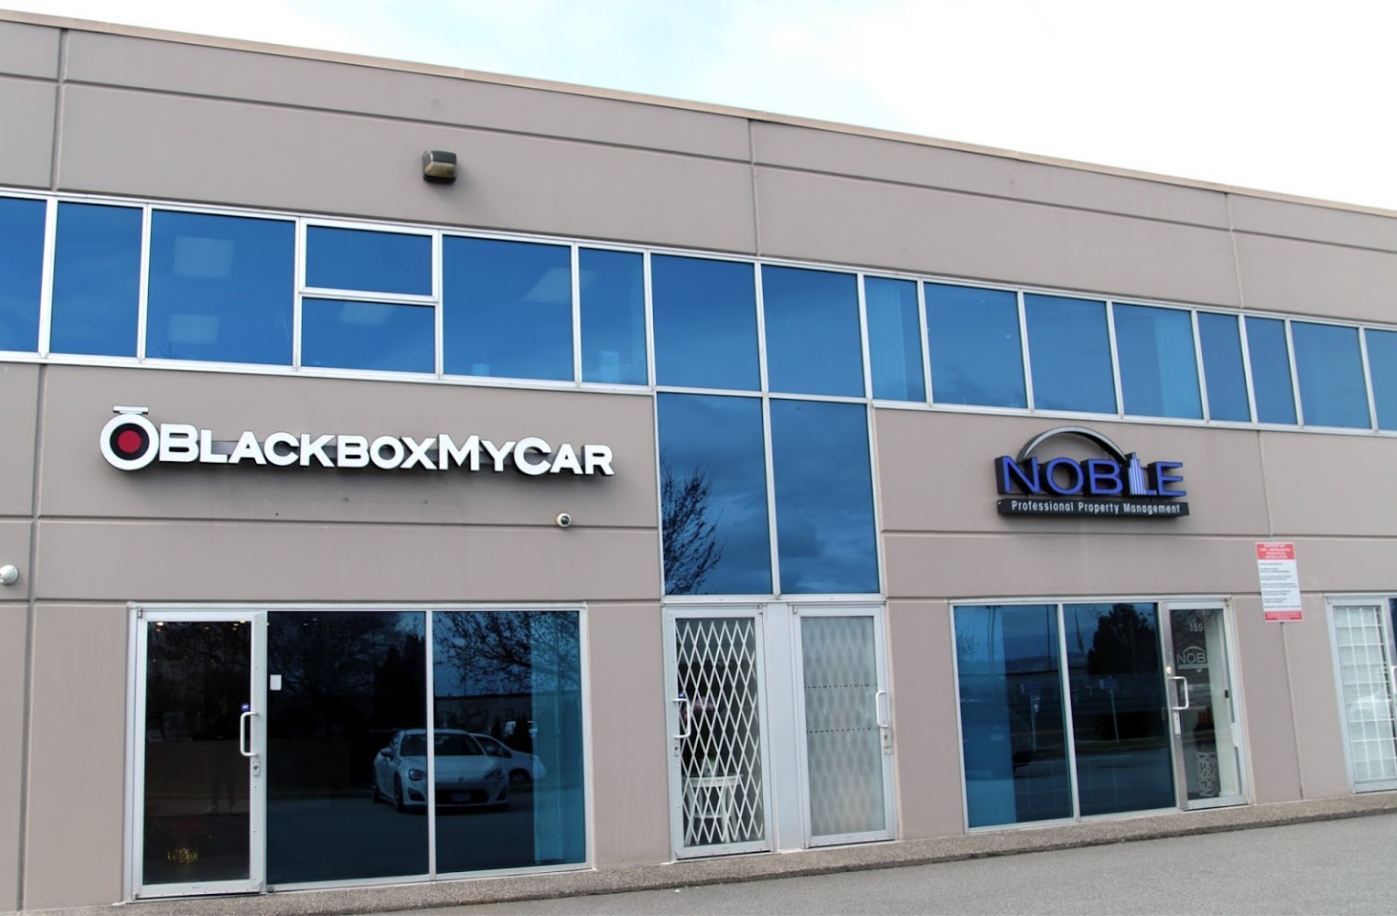 BlackboxMyCar's office in Richmond, BC